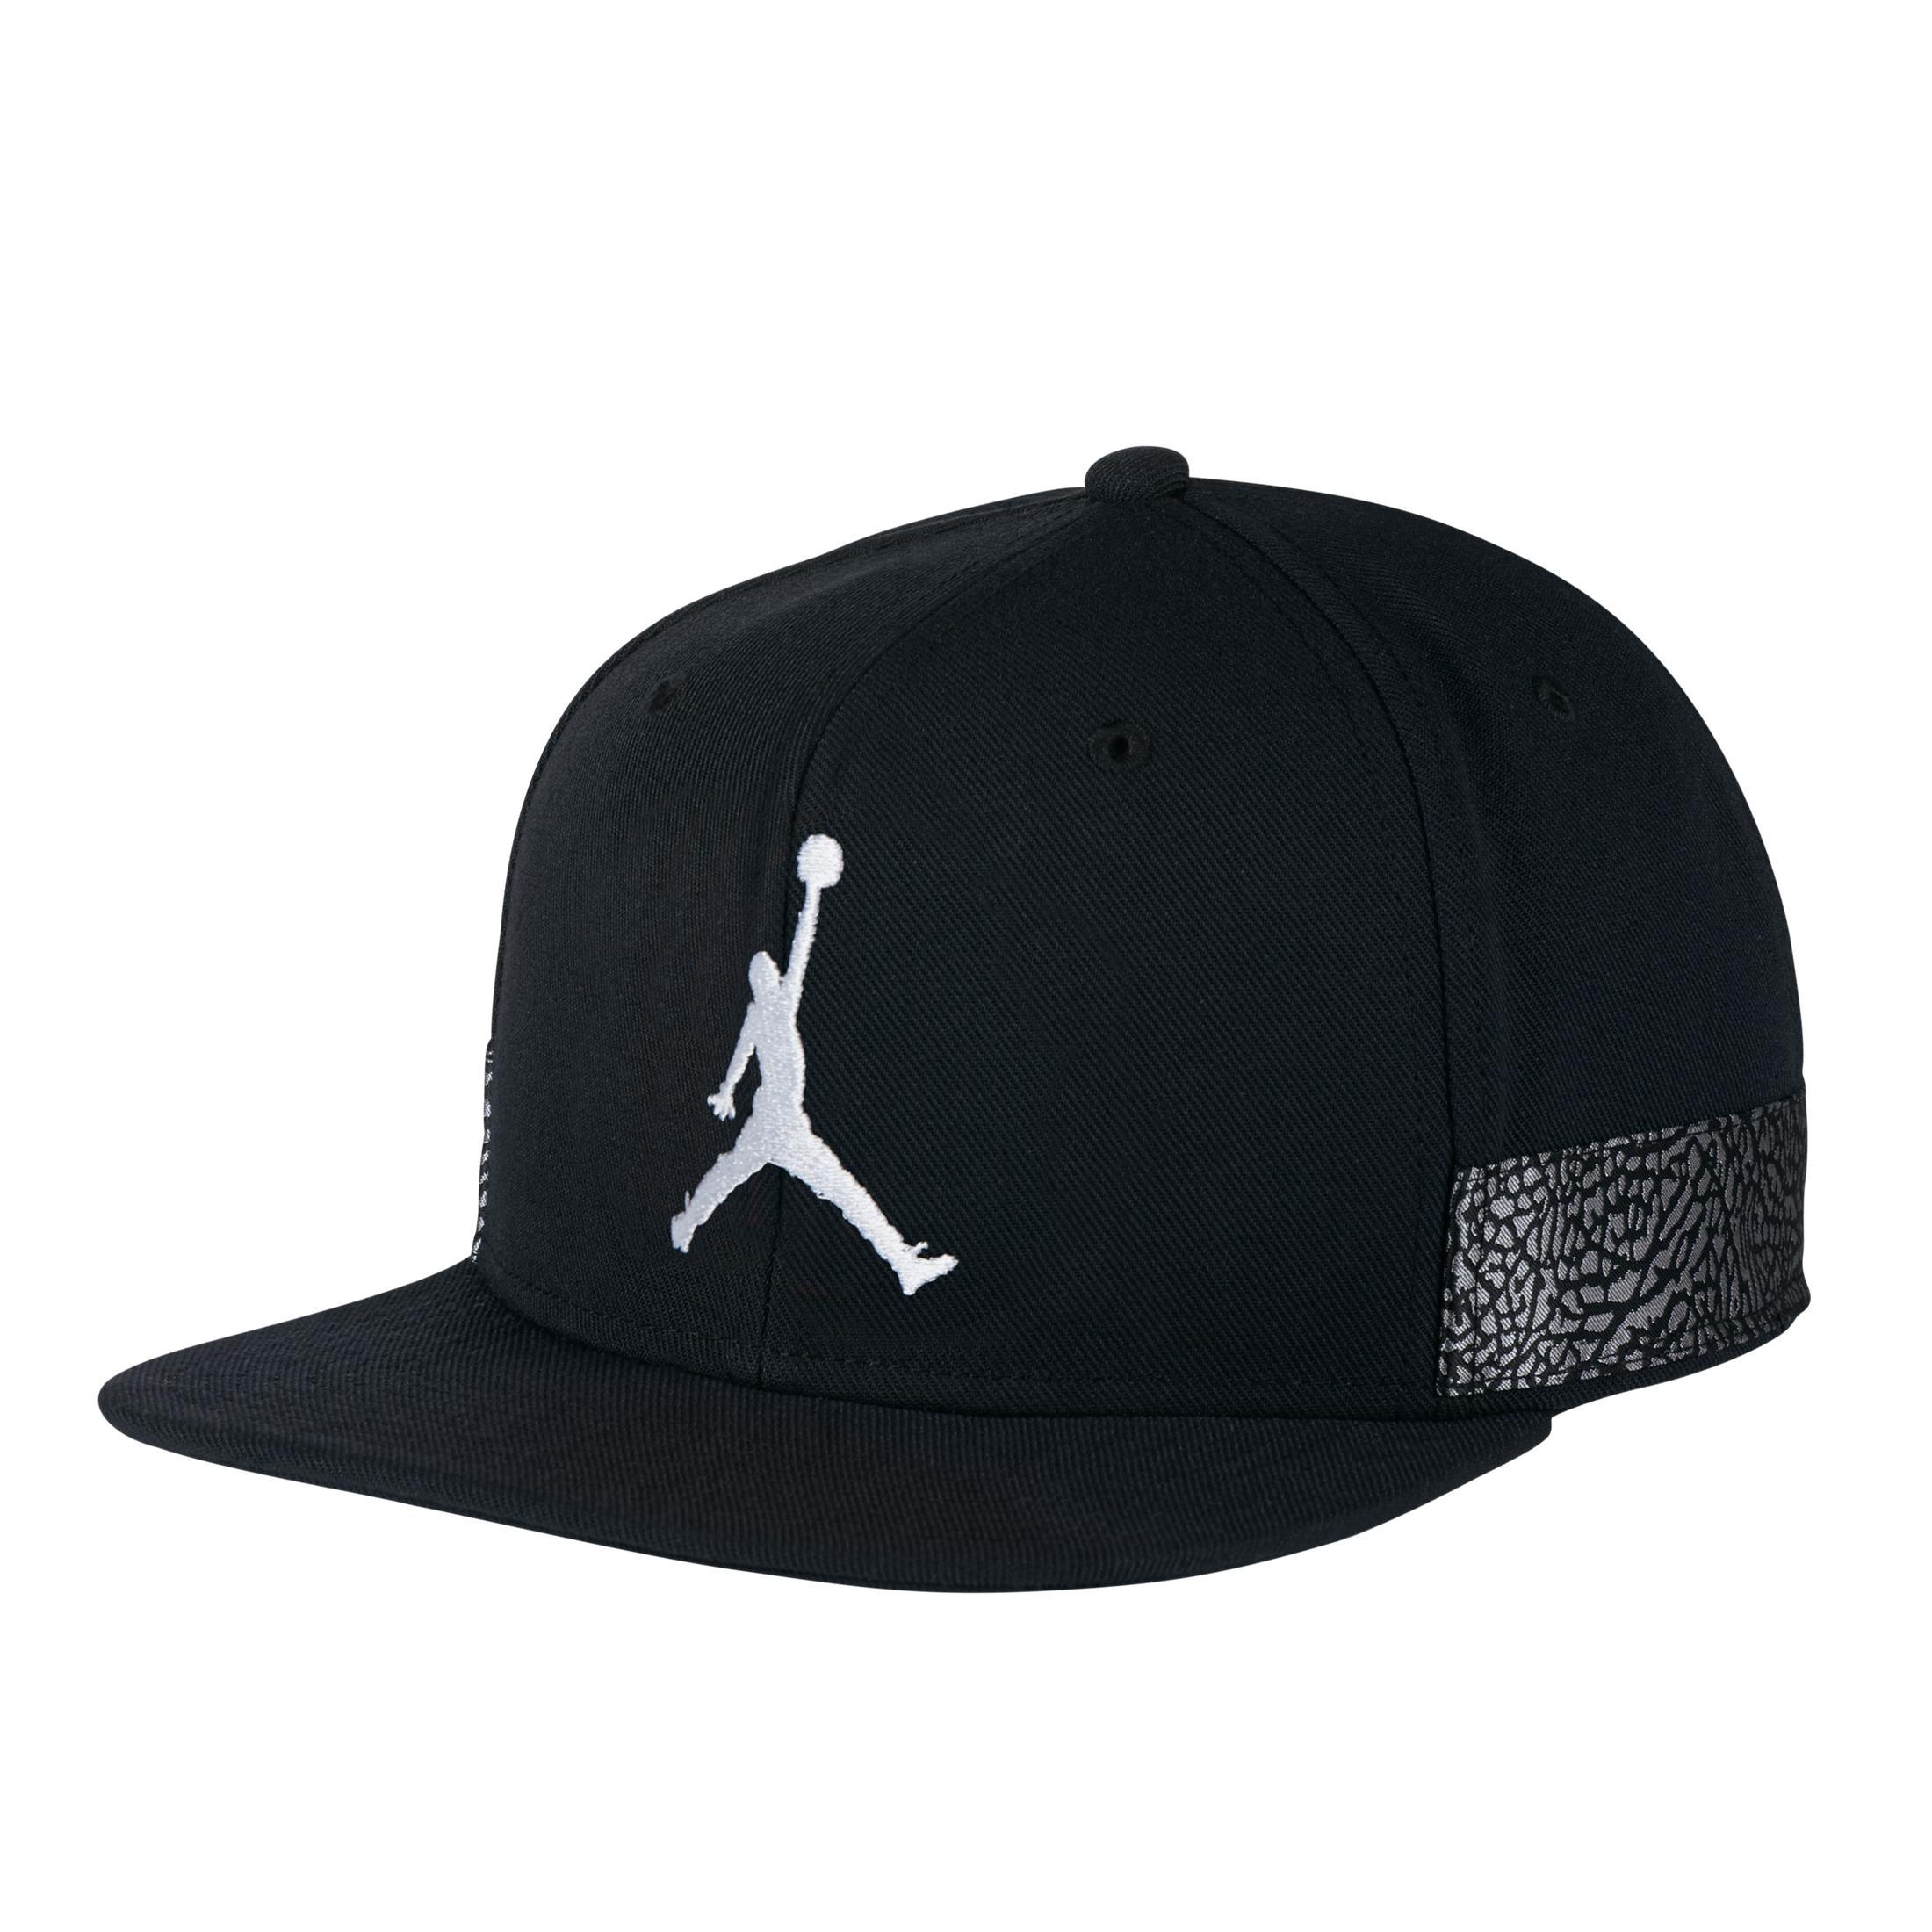 fce818640b2 Nike Nike Air Jordan 3 Jumpman Pro Cap in Black for Men - Lyst